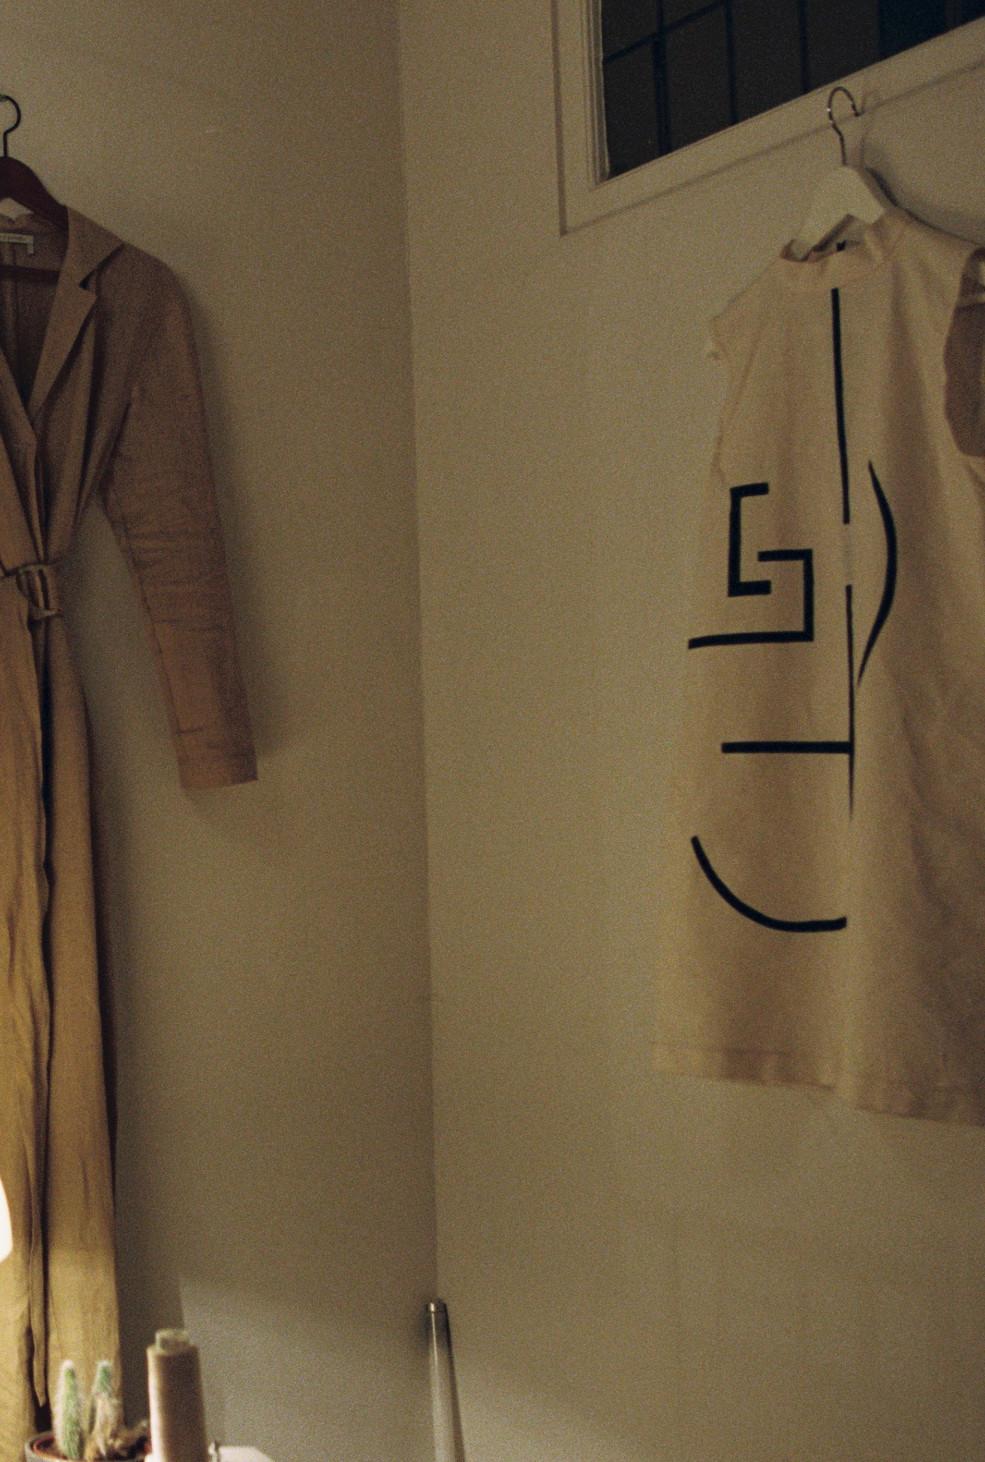 Studio Joko store and studio visit: Atelier Paradis, Jordaan, Amsterdam